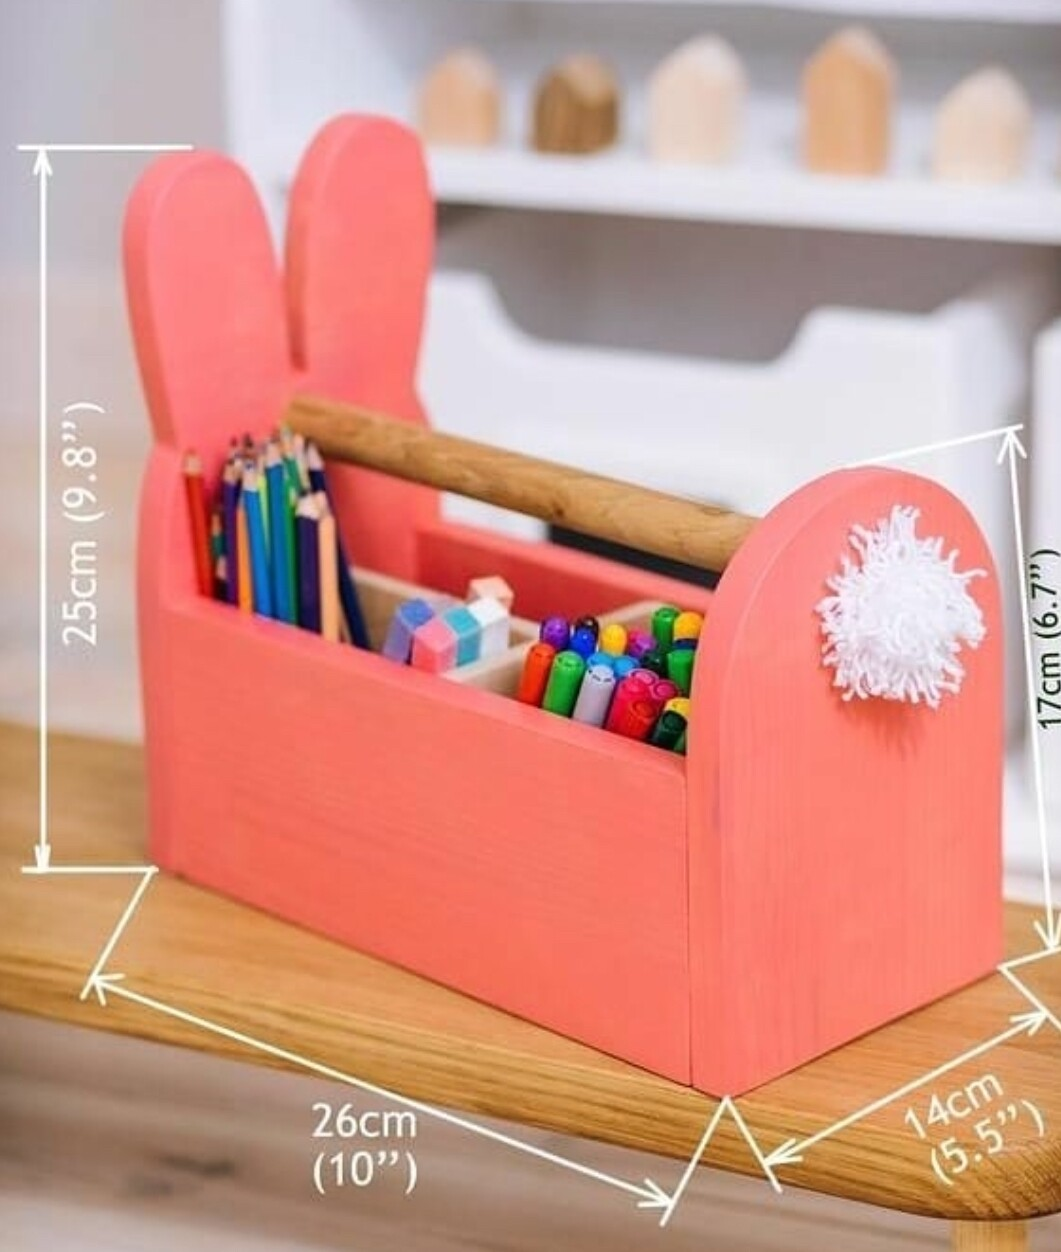 Bunny Rabbit Pencil Holder and Storage